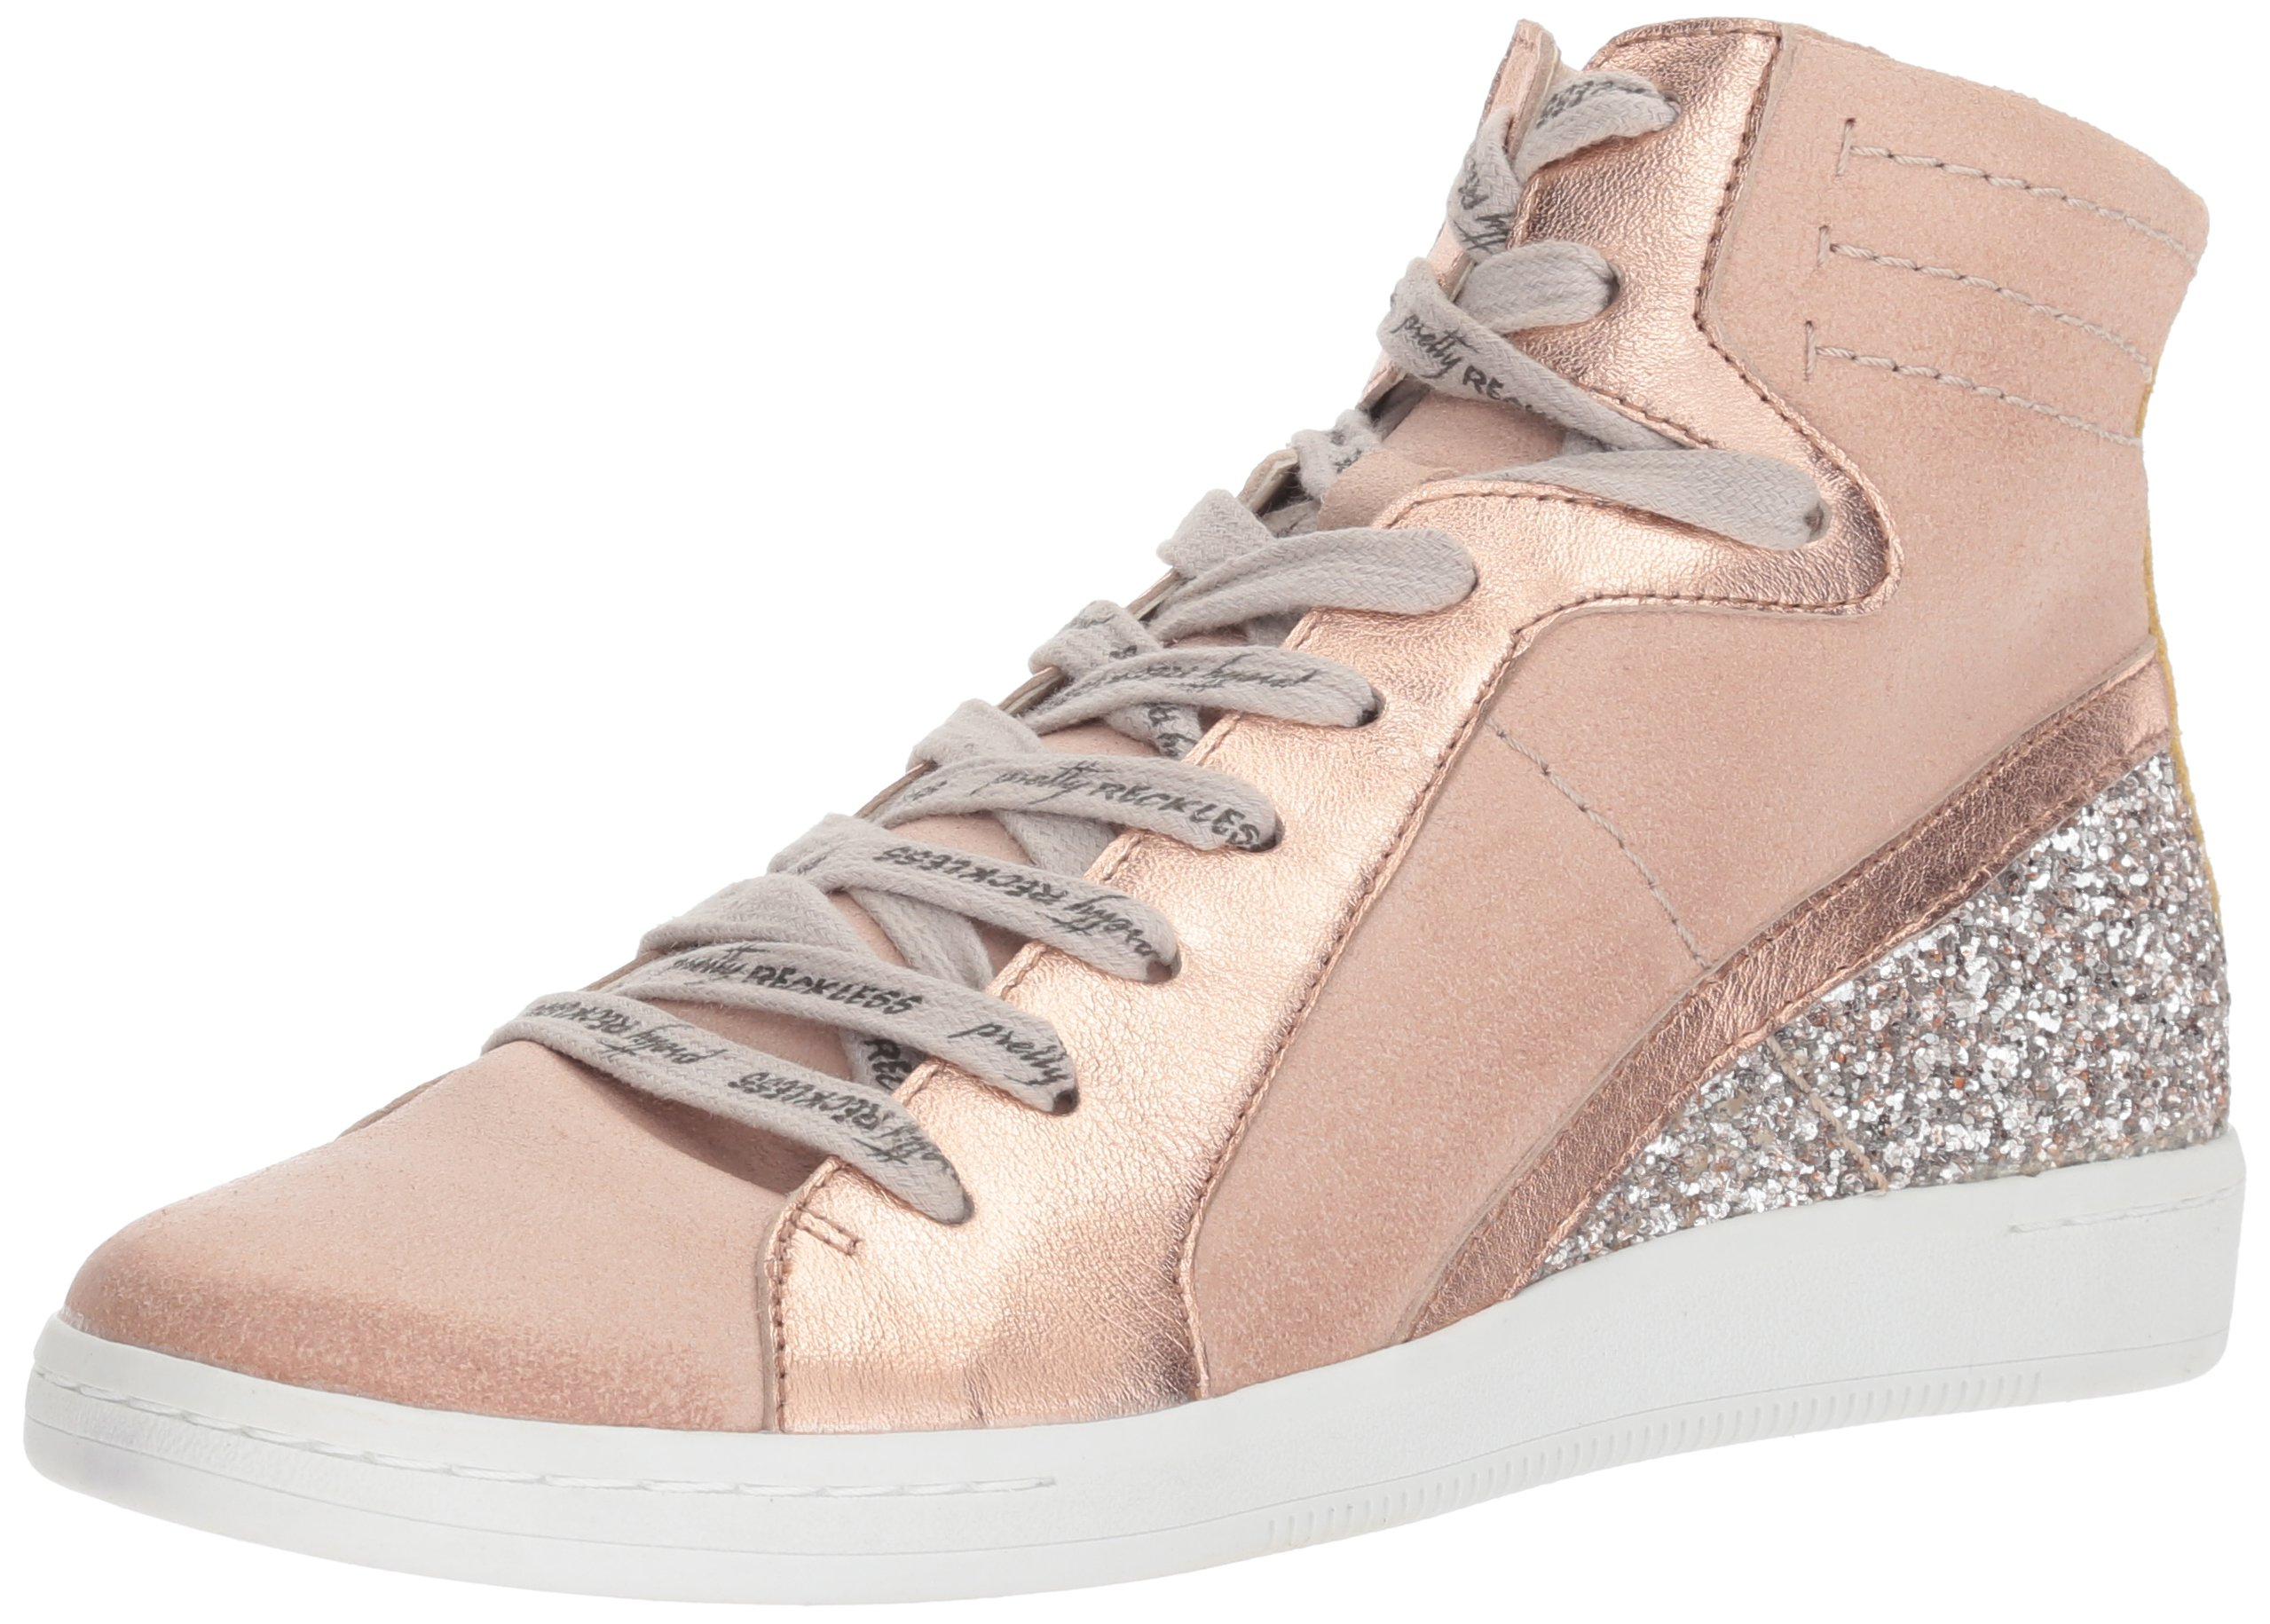 Dolce Vita Women's Natty Sneaker, Blush Suede, 8.5 Medium US